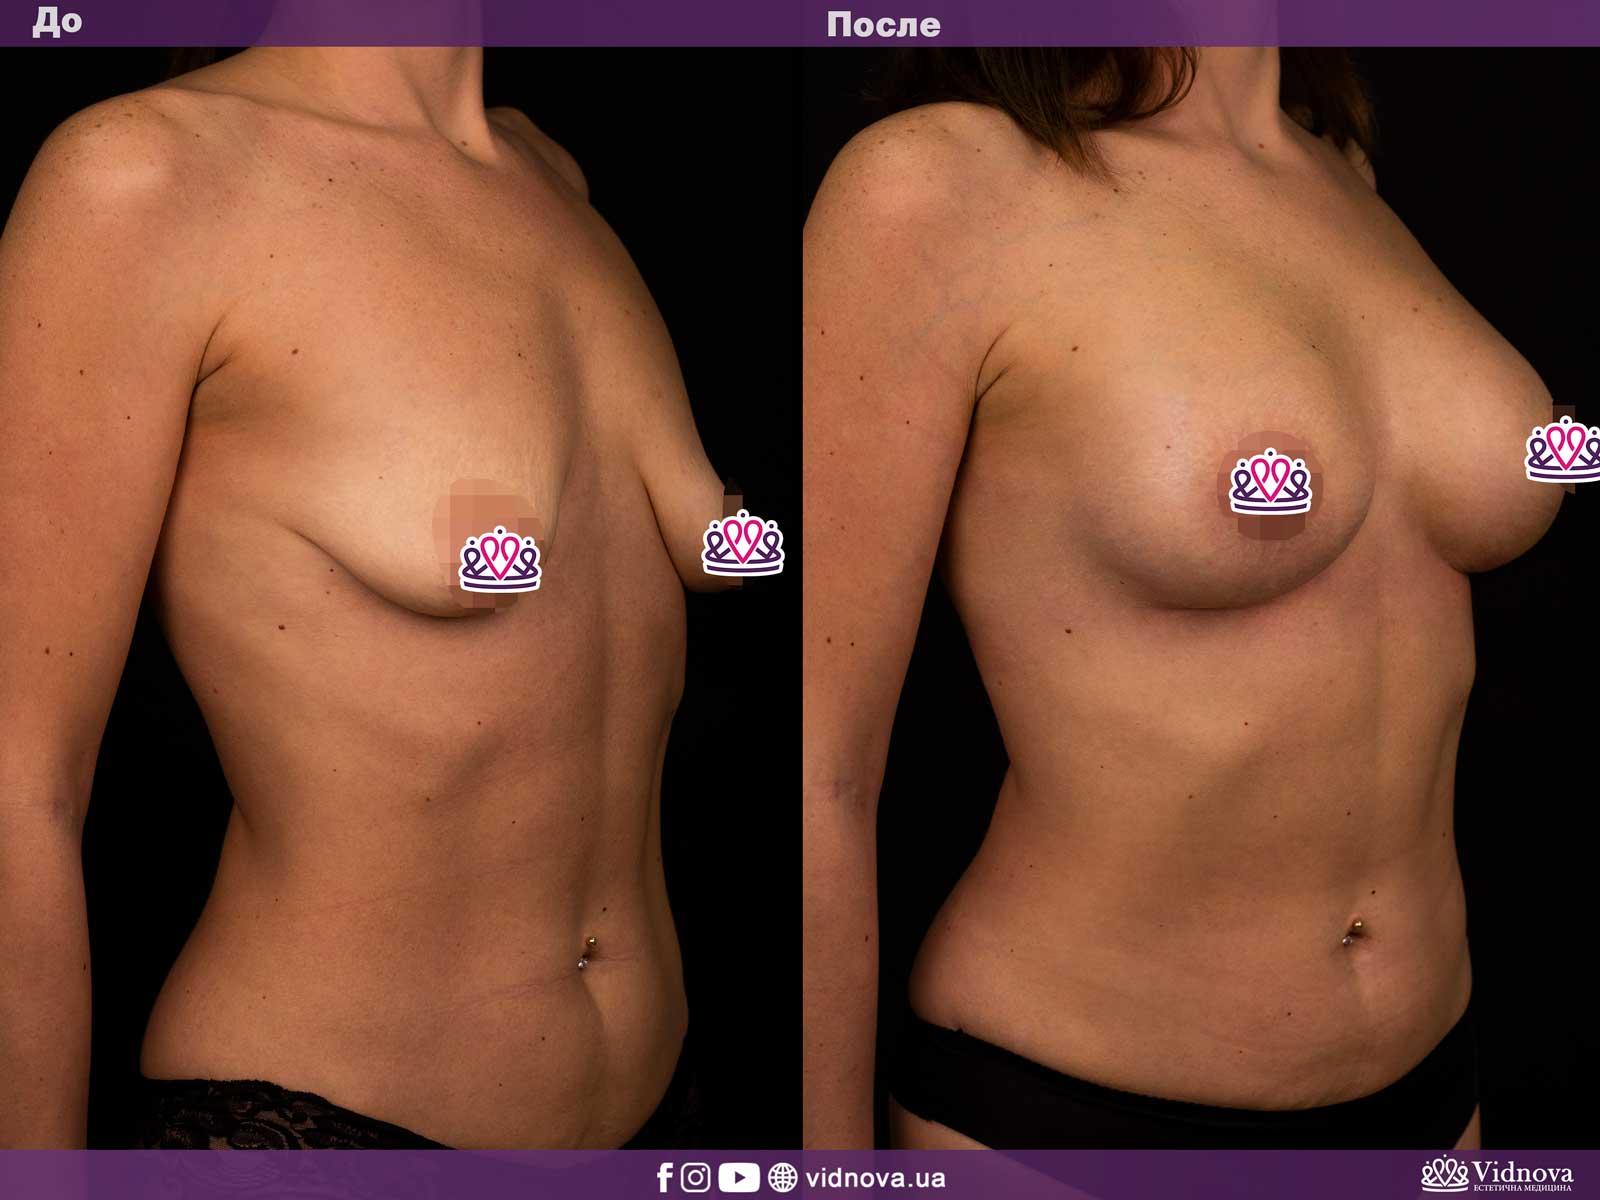 Подтяжка груди: Фото ДО и ПОСЛЕ - Пример №3-2 - Клиника Vidnova